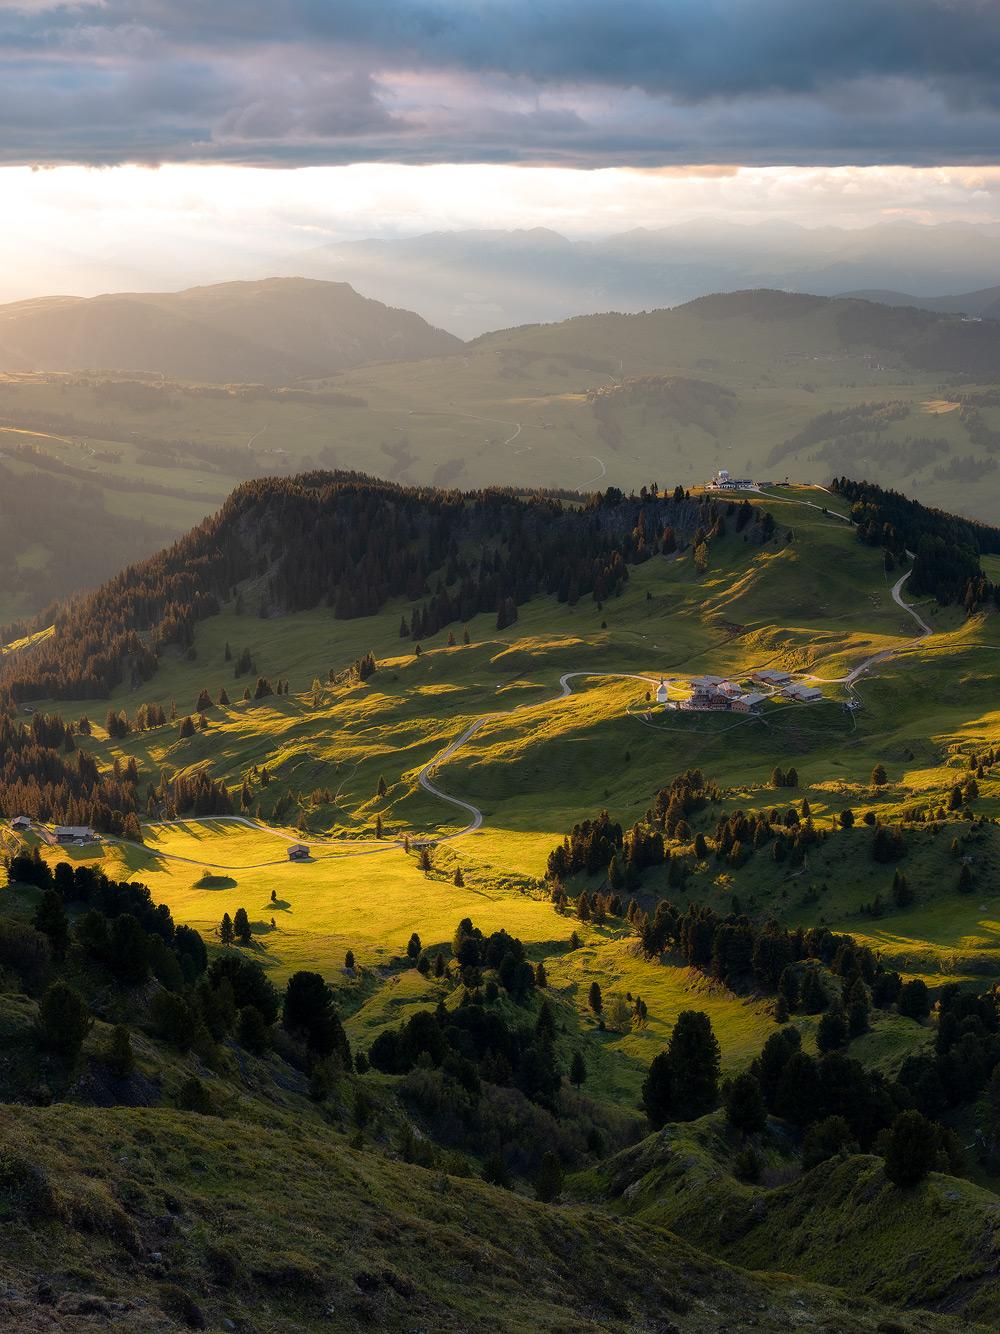 Alpe di Siusi, Dolomites, South Tyrol by Nils Leonhardt